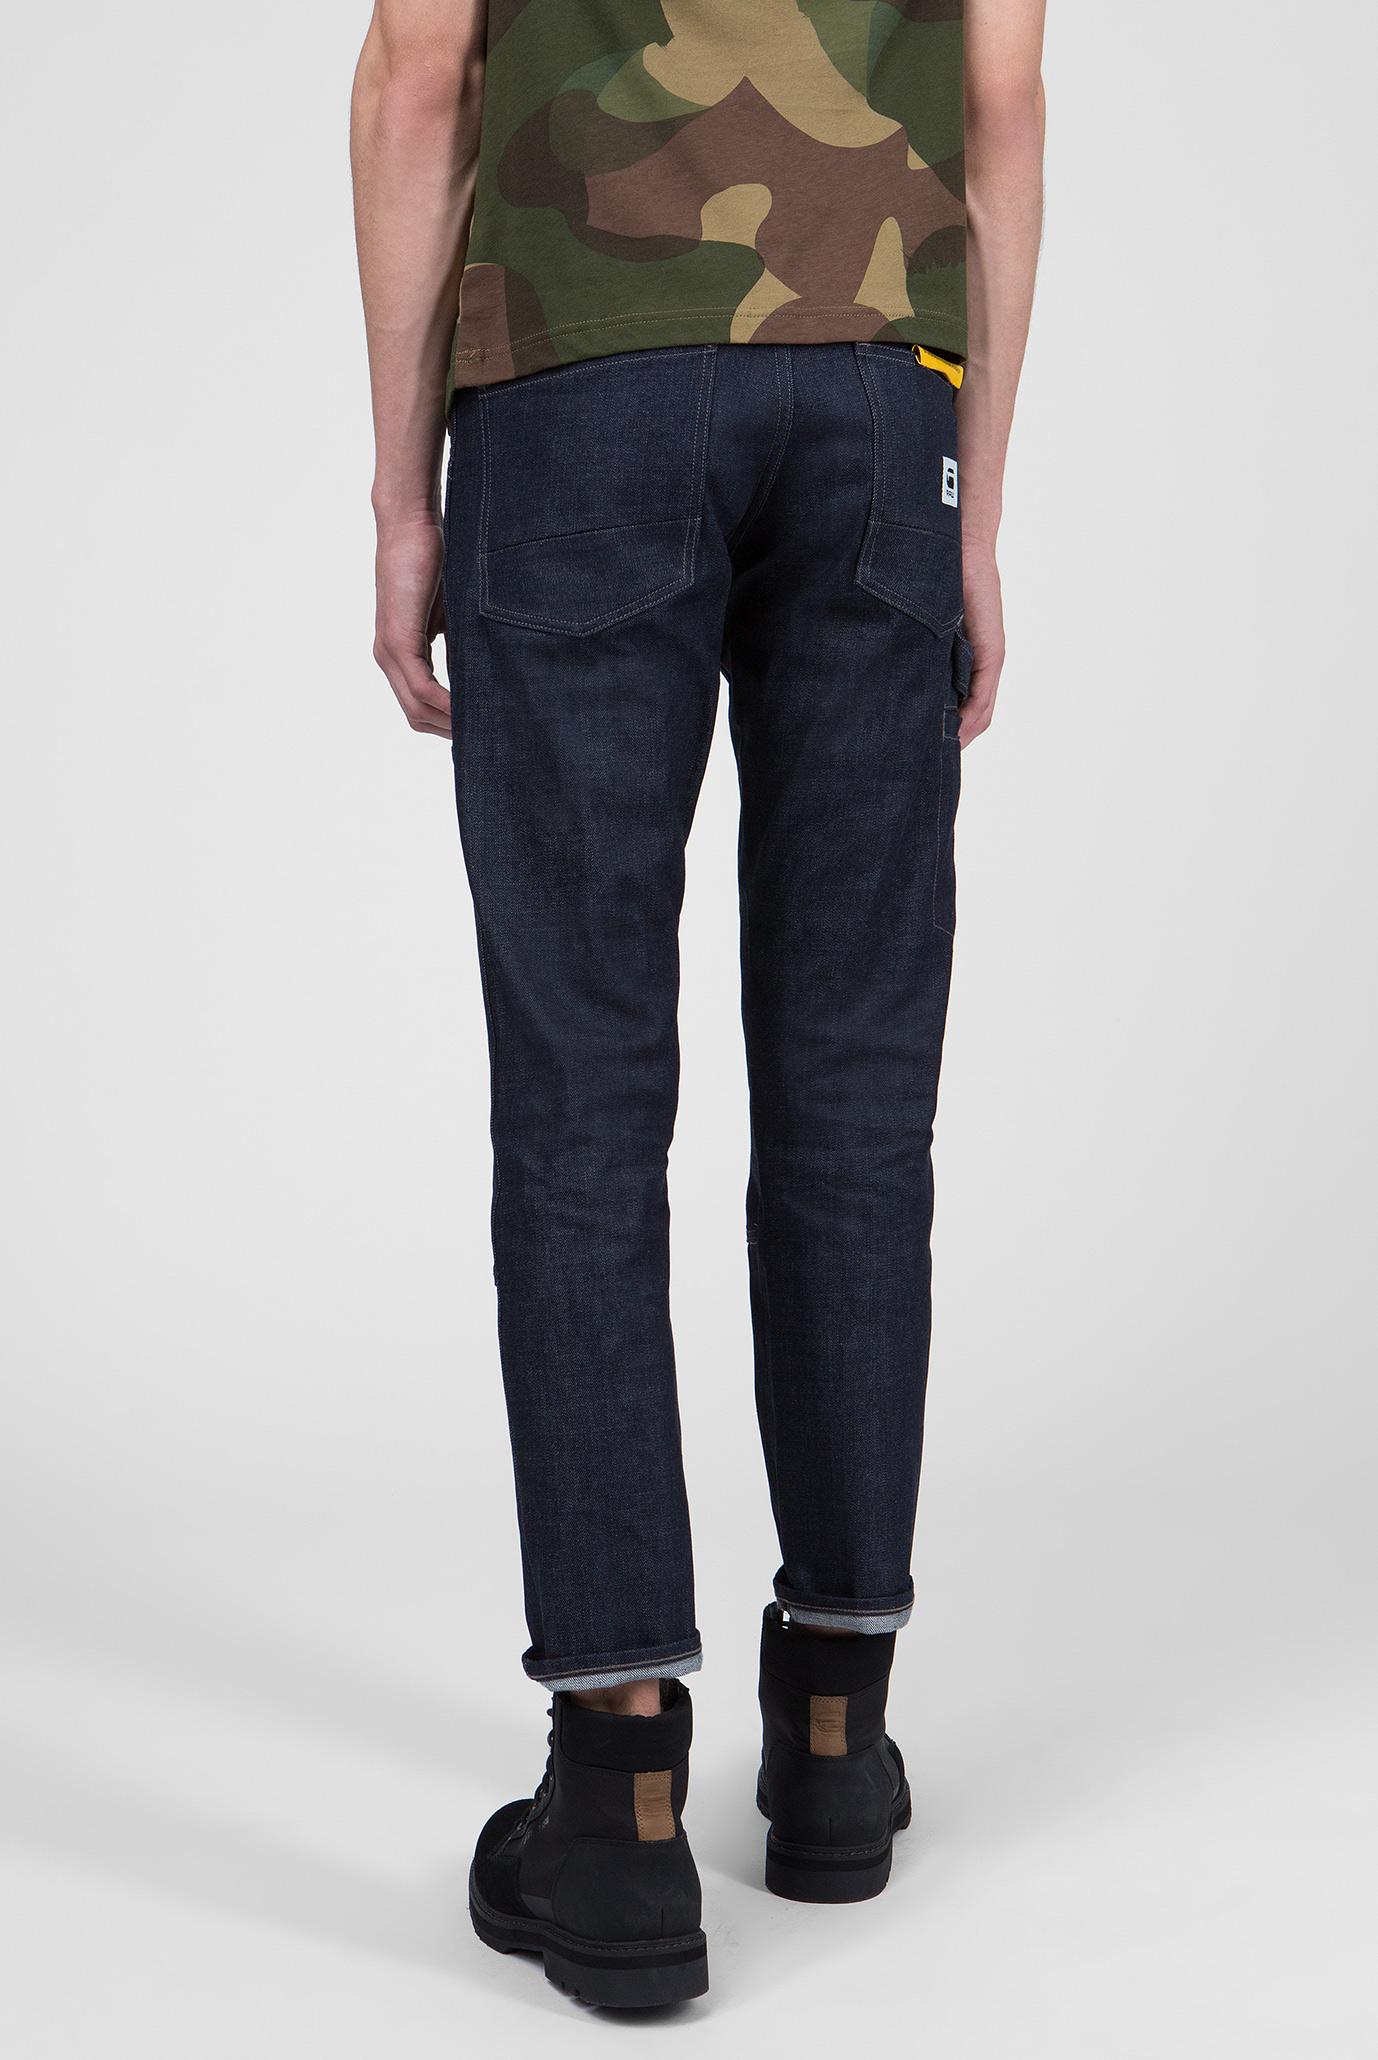 Купить Мужские темно-синие джинсы Faeroes Classic Straight Tapered  G-Star RAW G-Star RAW D11399,8595 – Киев, Украина. Цены в интернет магазине MD Fashion